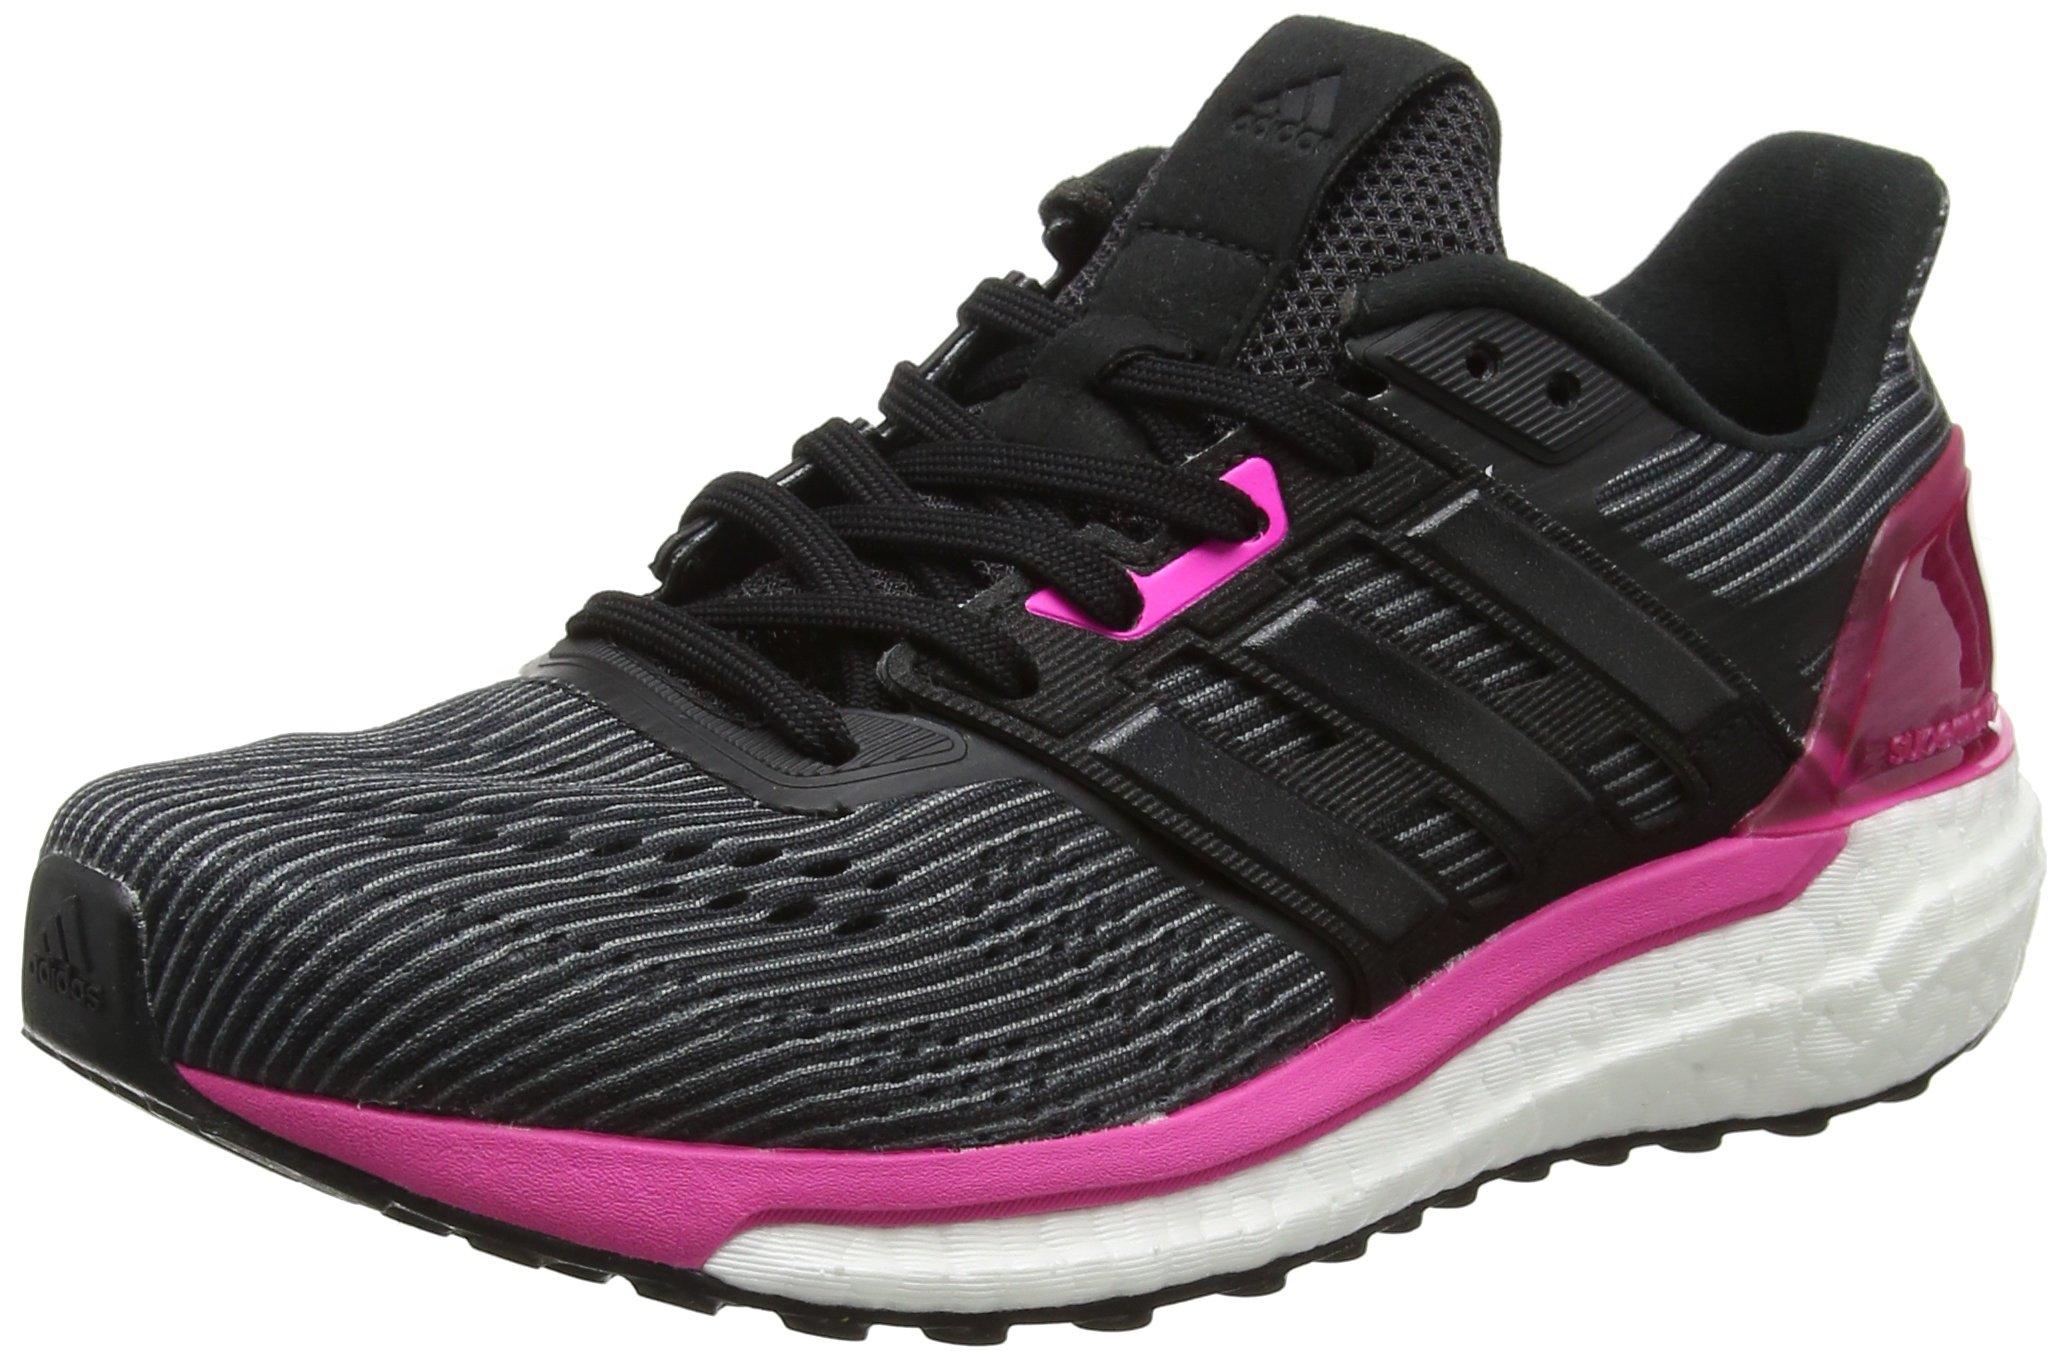 De FemmeNoirutility Adidas Eu Black shock Running Core Pink38 SupernovaChaussures PiuXZTOk